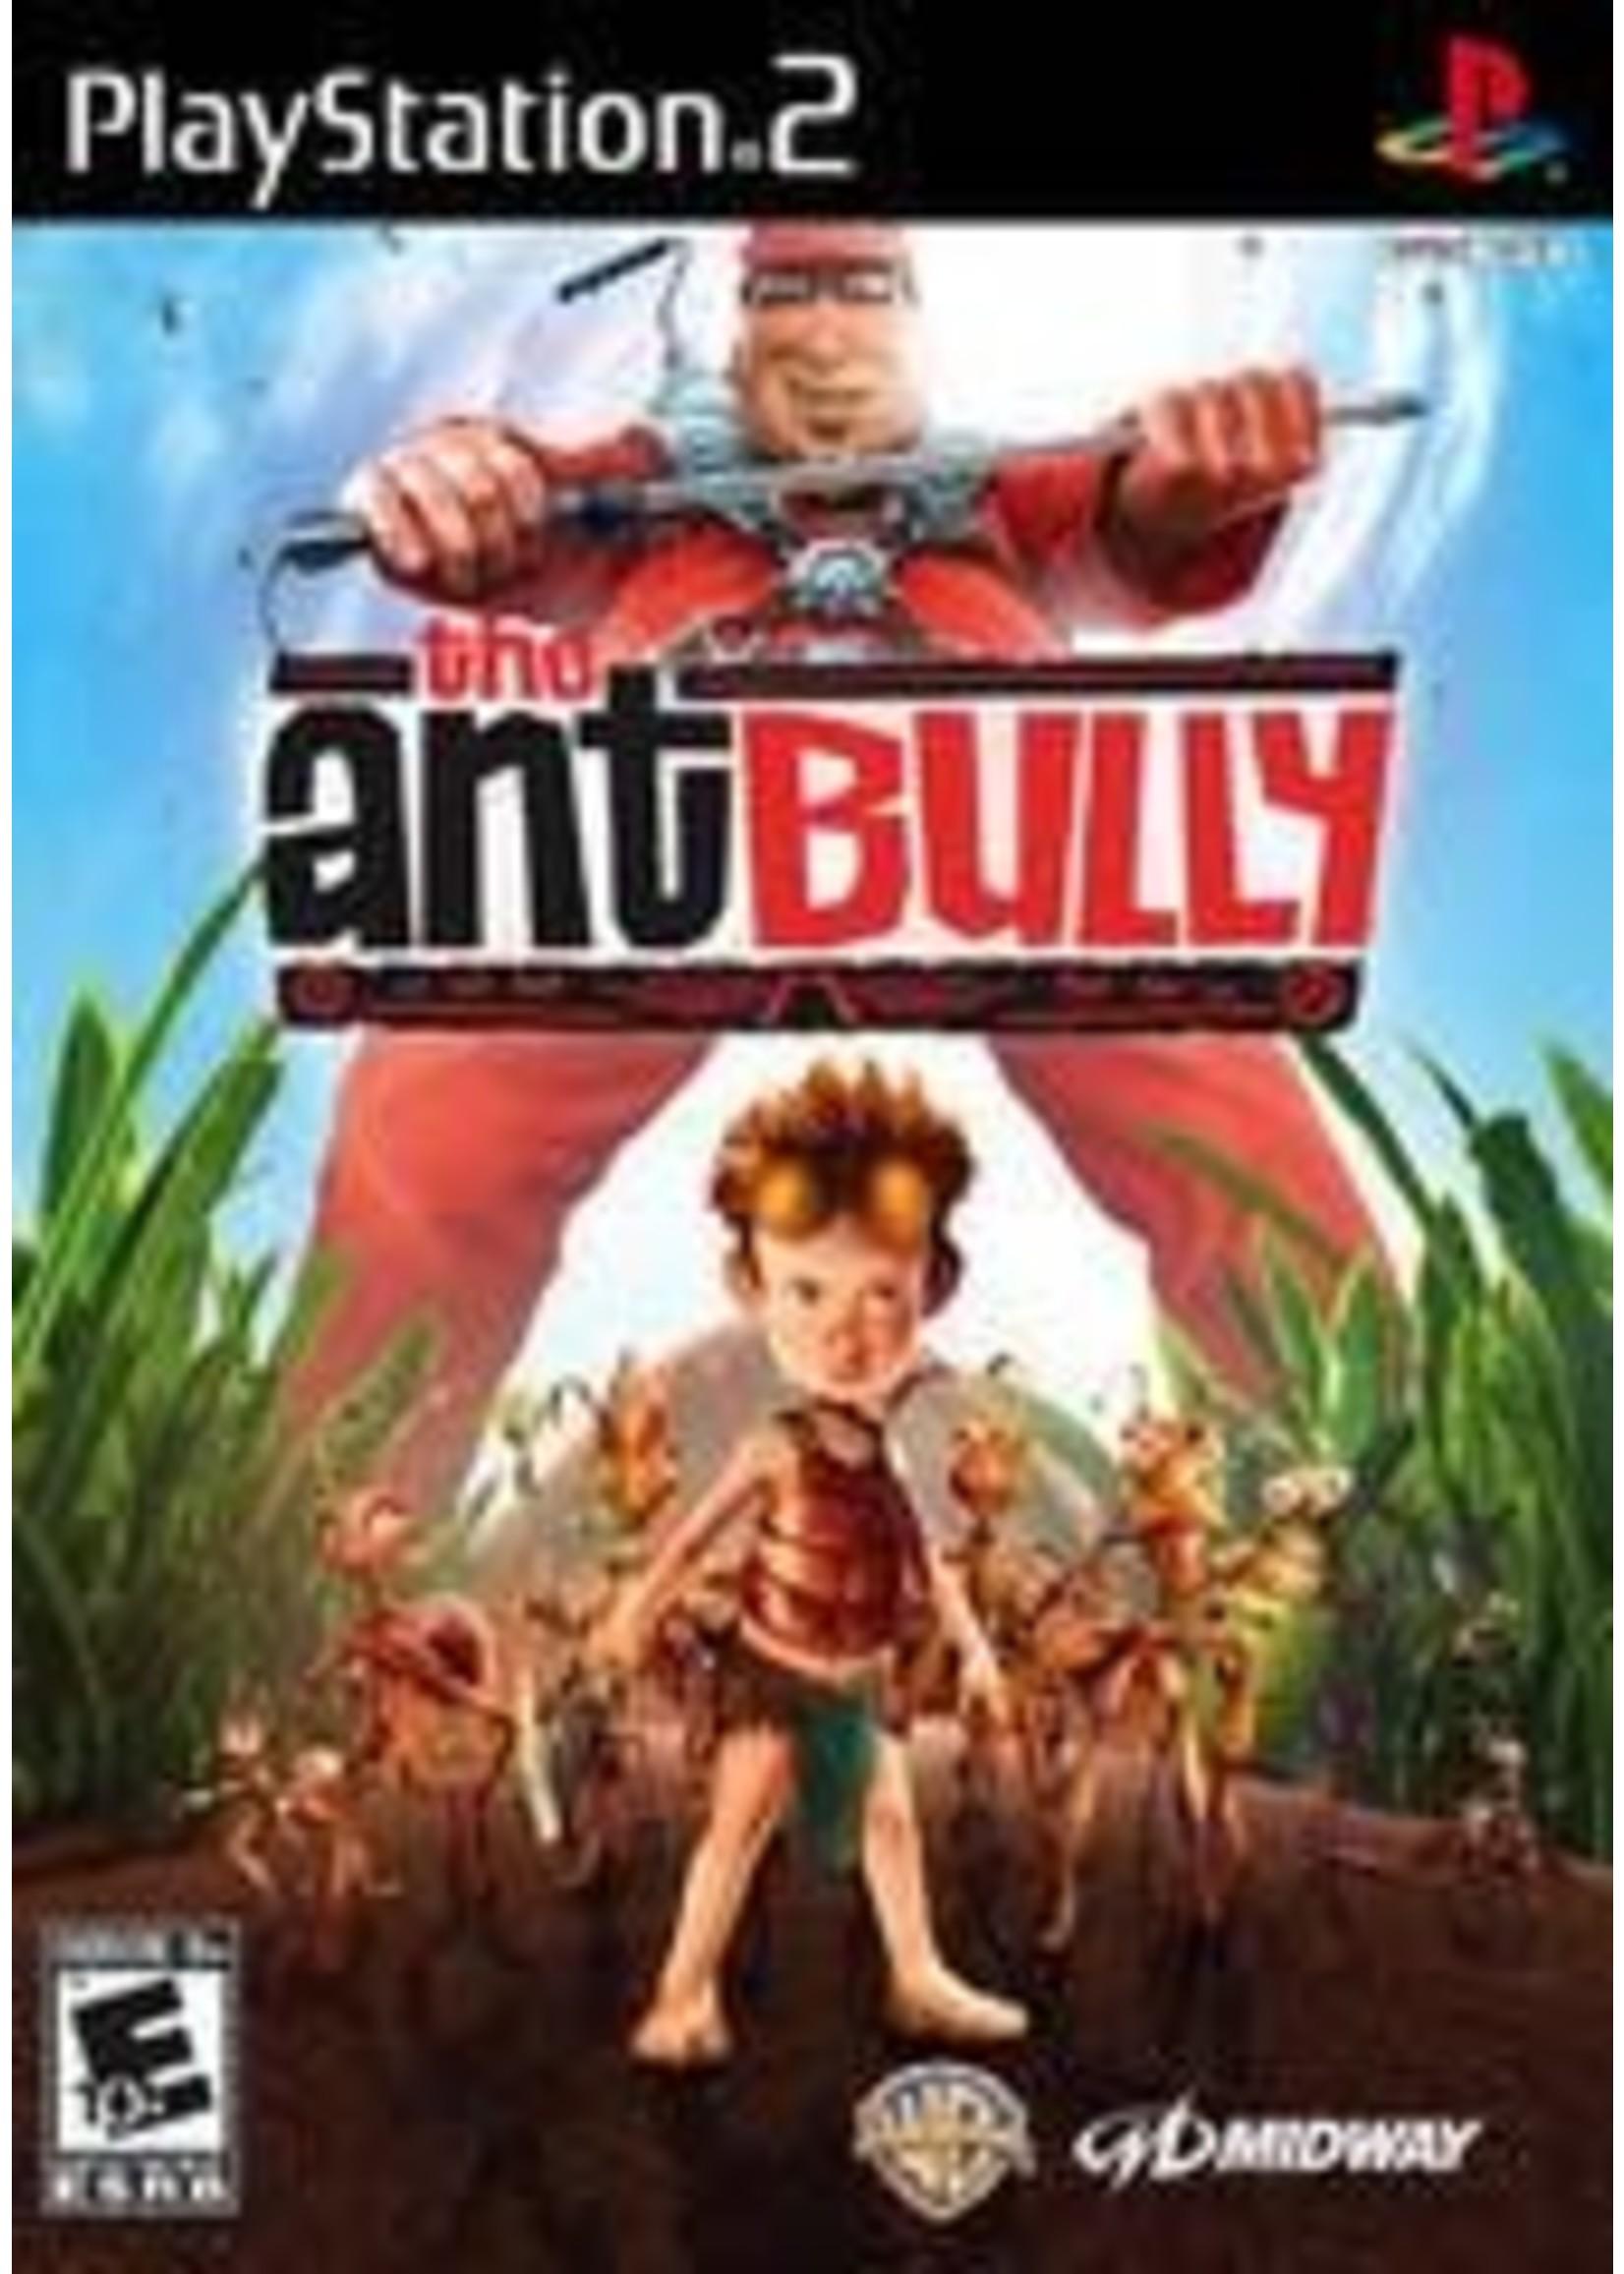 Ant Bully Playstation 2